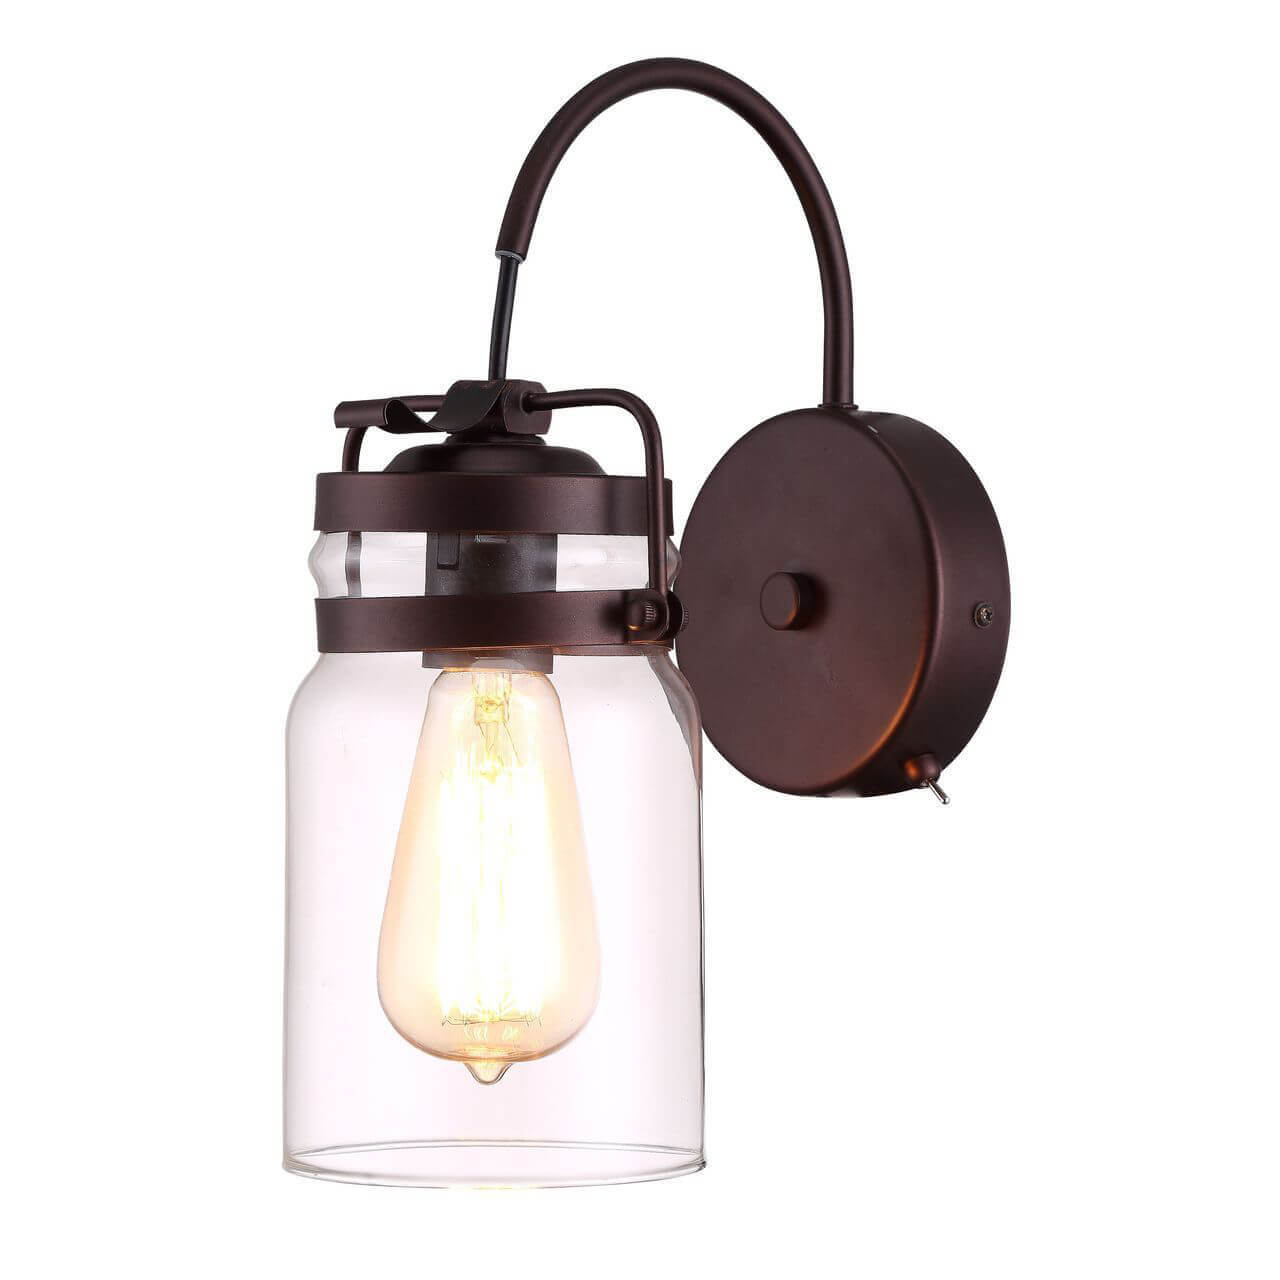 Бра Arte Lamp Bene A9179AP-1CK бра arte lamp bene a9179ap 1ck